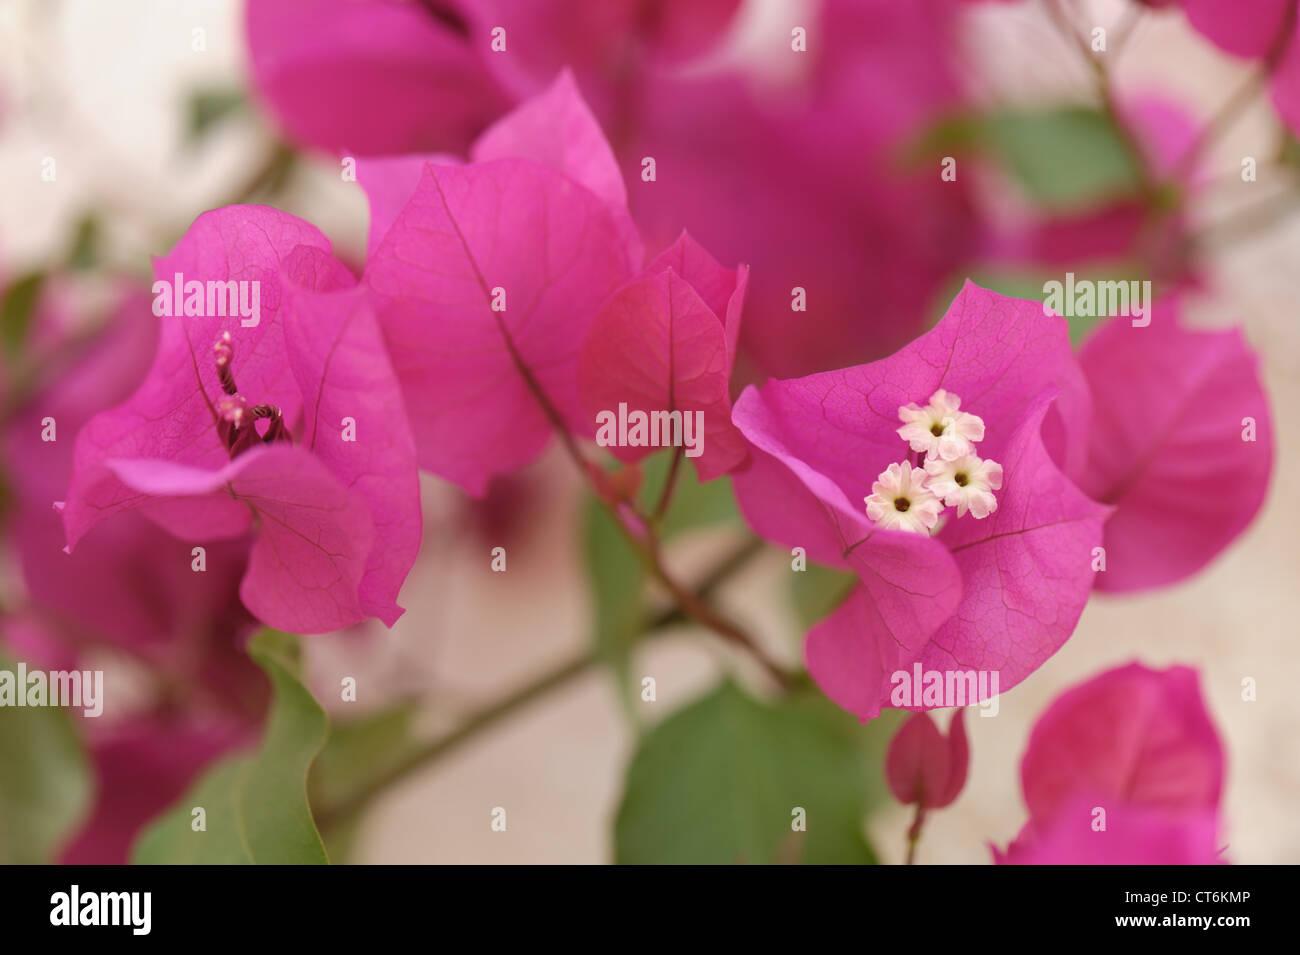 Flowering purple bougainvillea plant in a conservatory (Bougainvillea glabra) - Stock Image